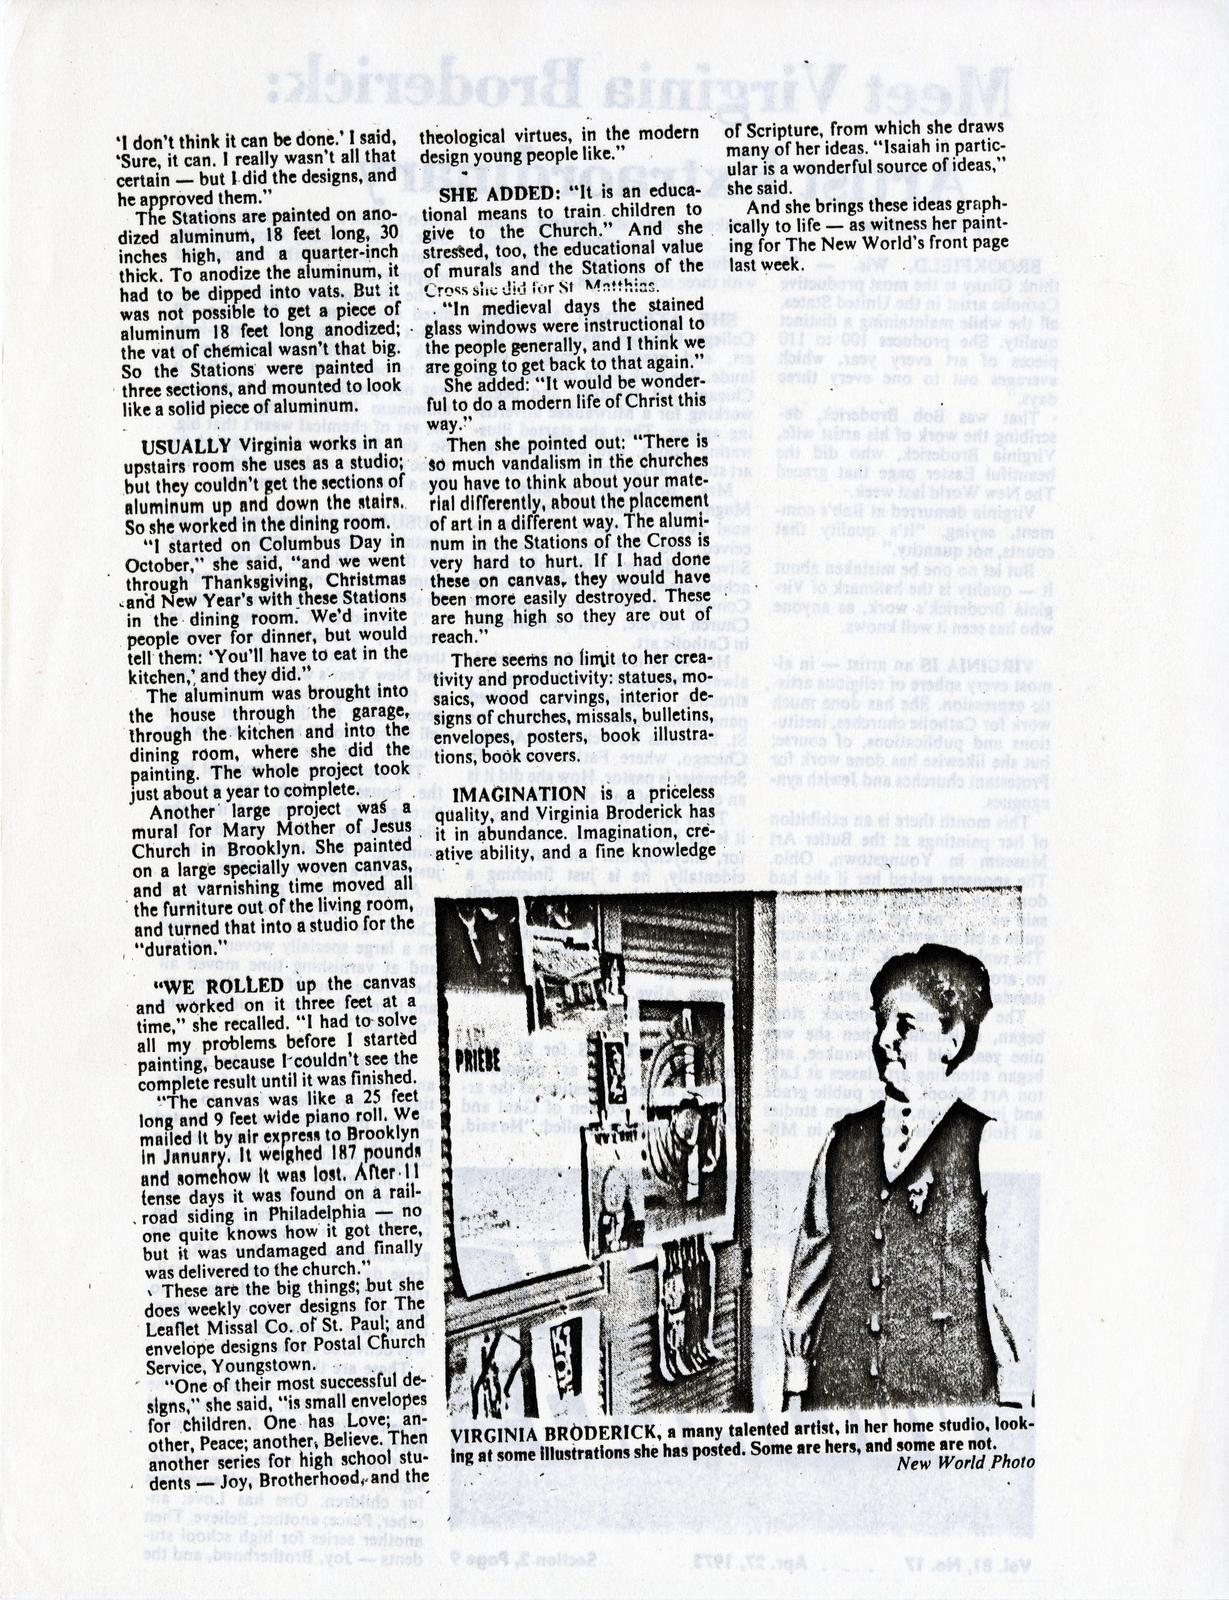 Articles: Virginia Broderick Artist Extraordinary